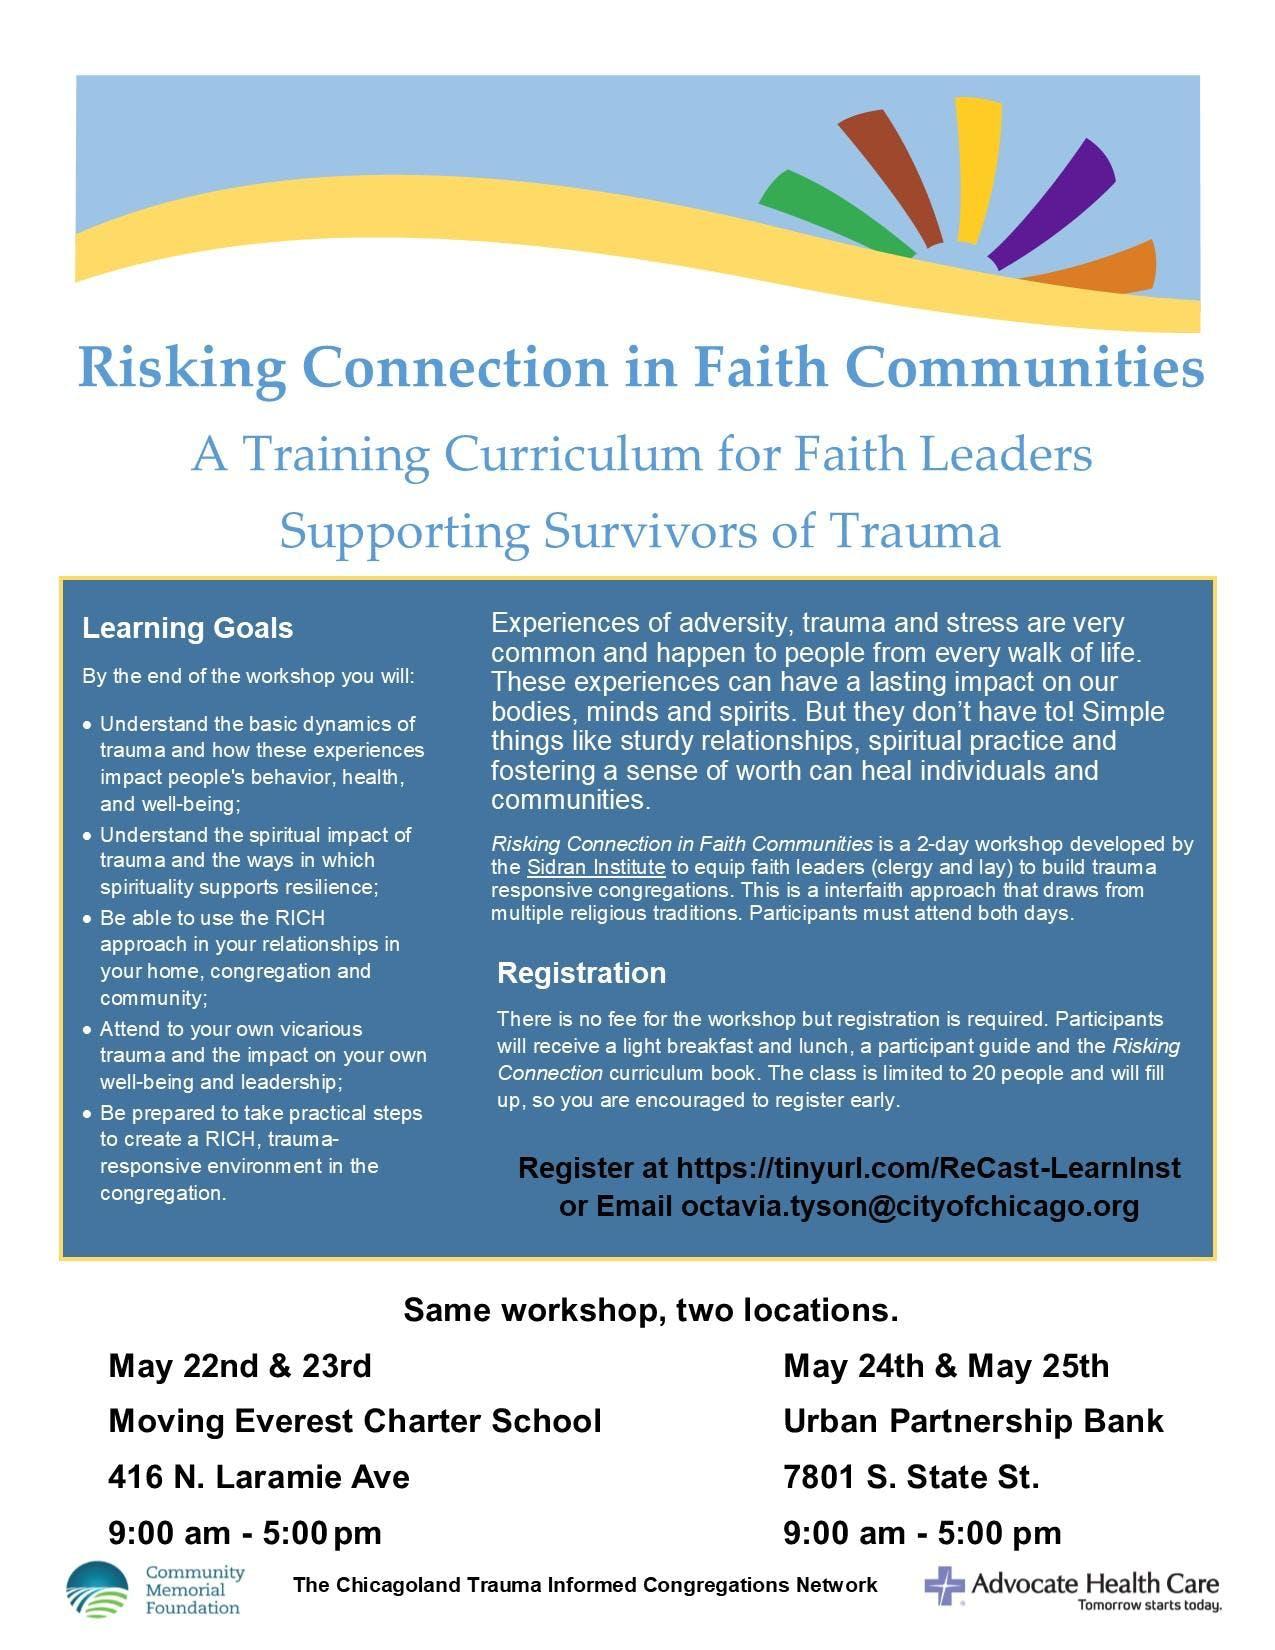 Trauma-Informed Faith Communities at Moving Everest Charter School ...